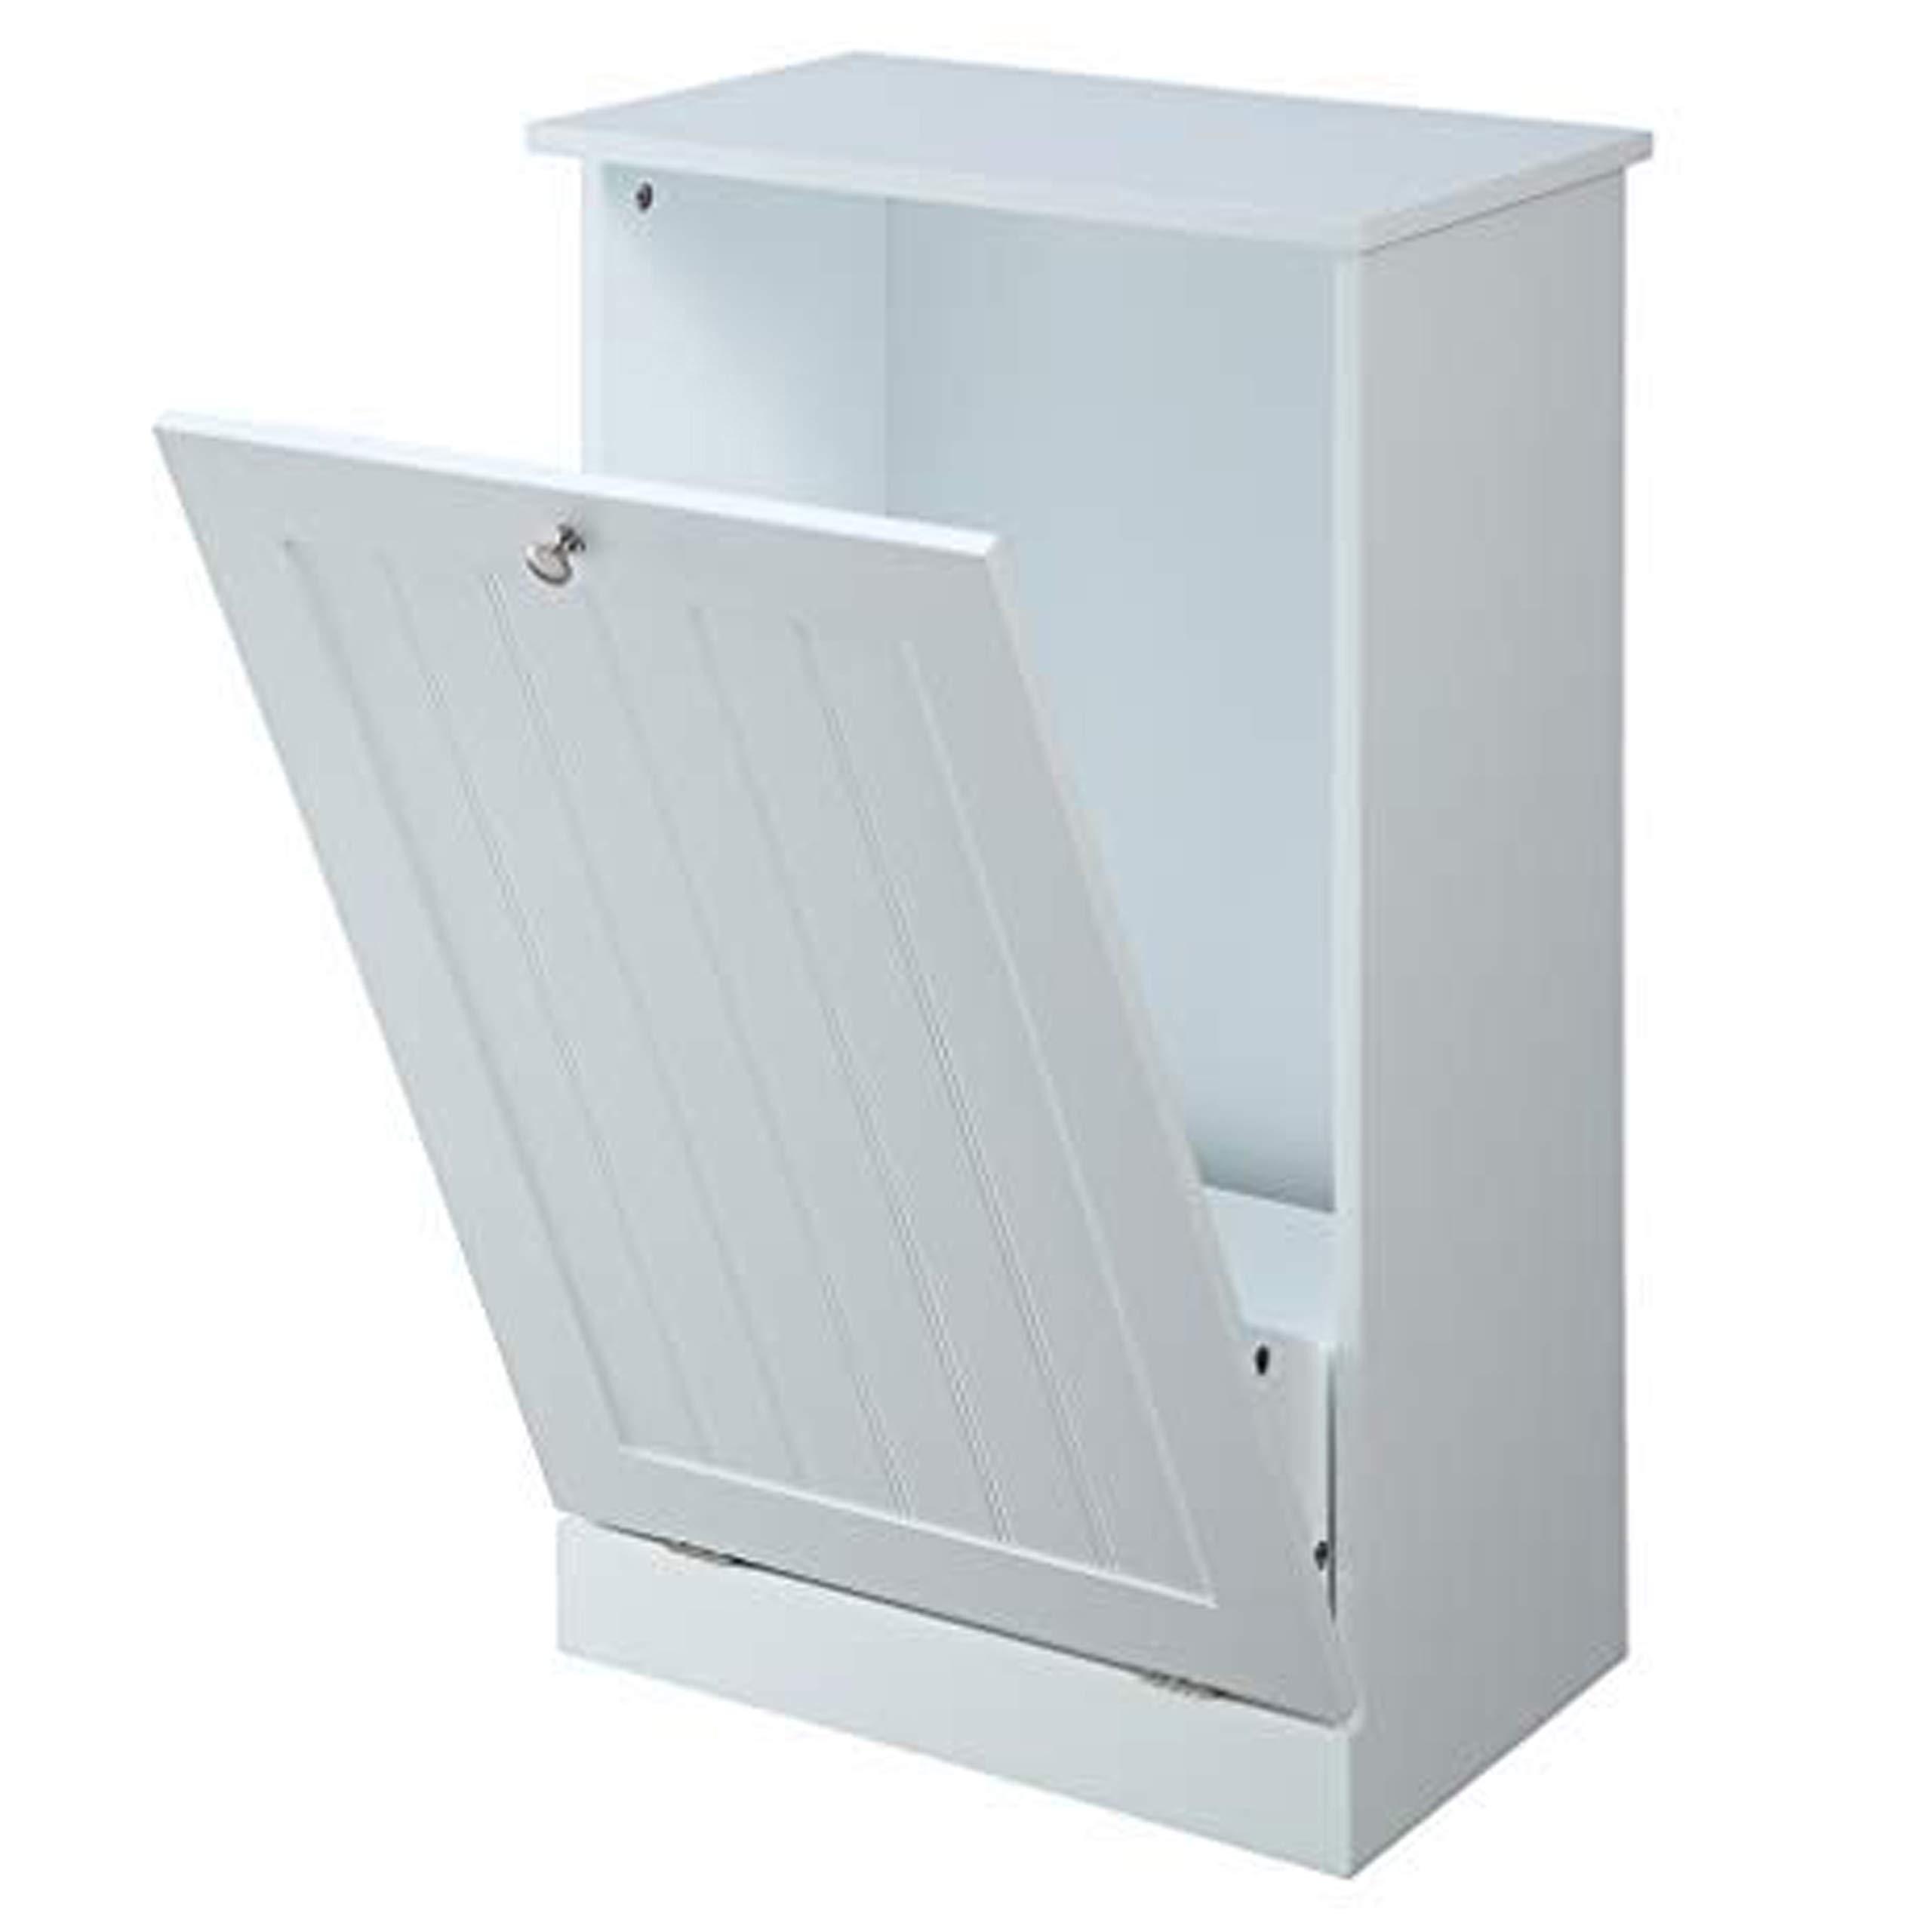 Tilt Out Trash Cabinet by Seven Oaks (White)